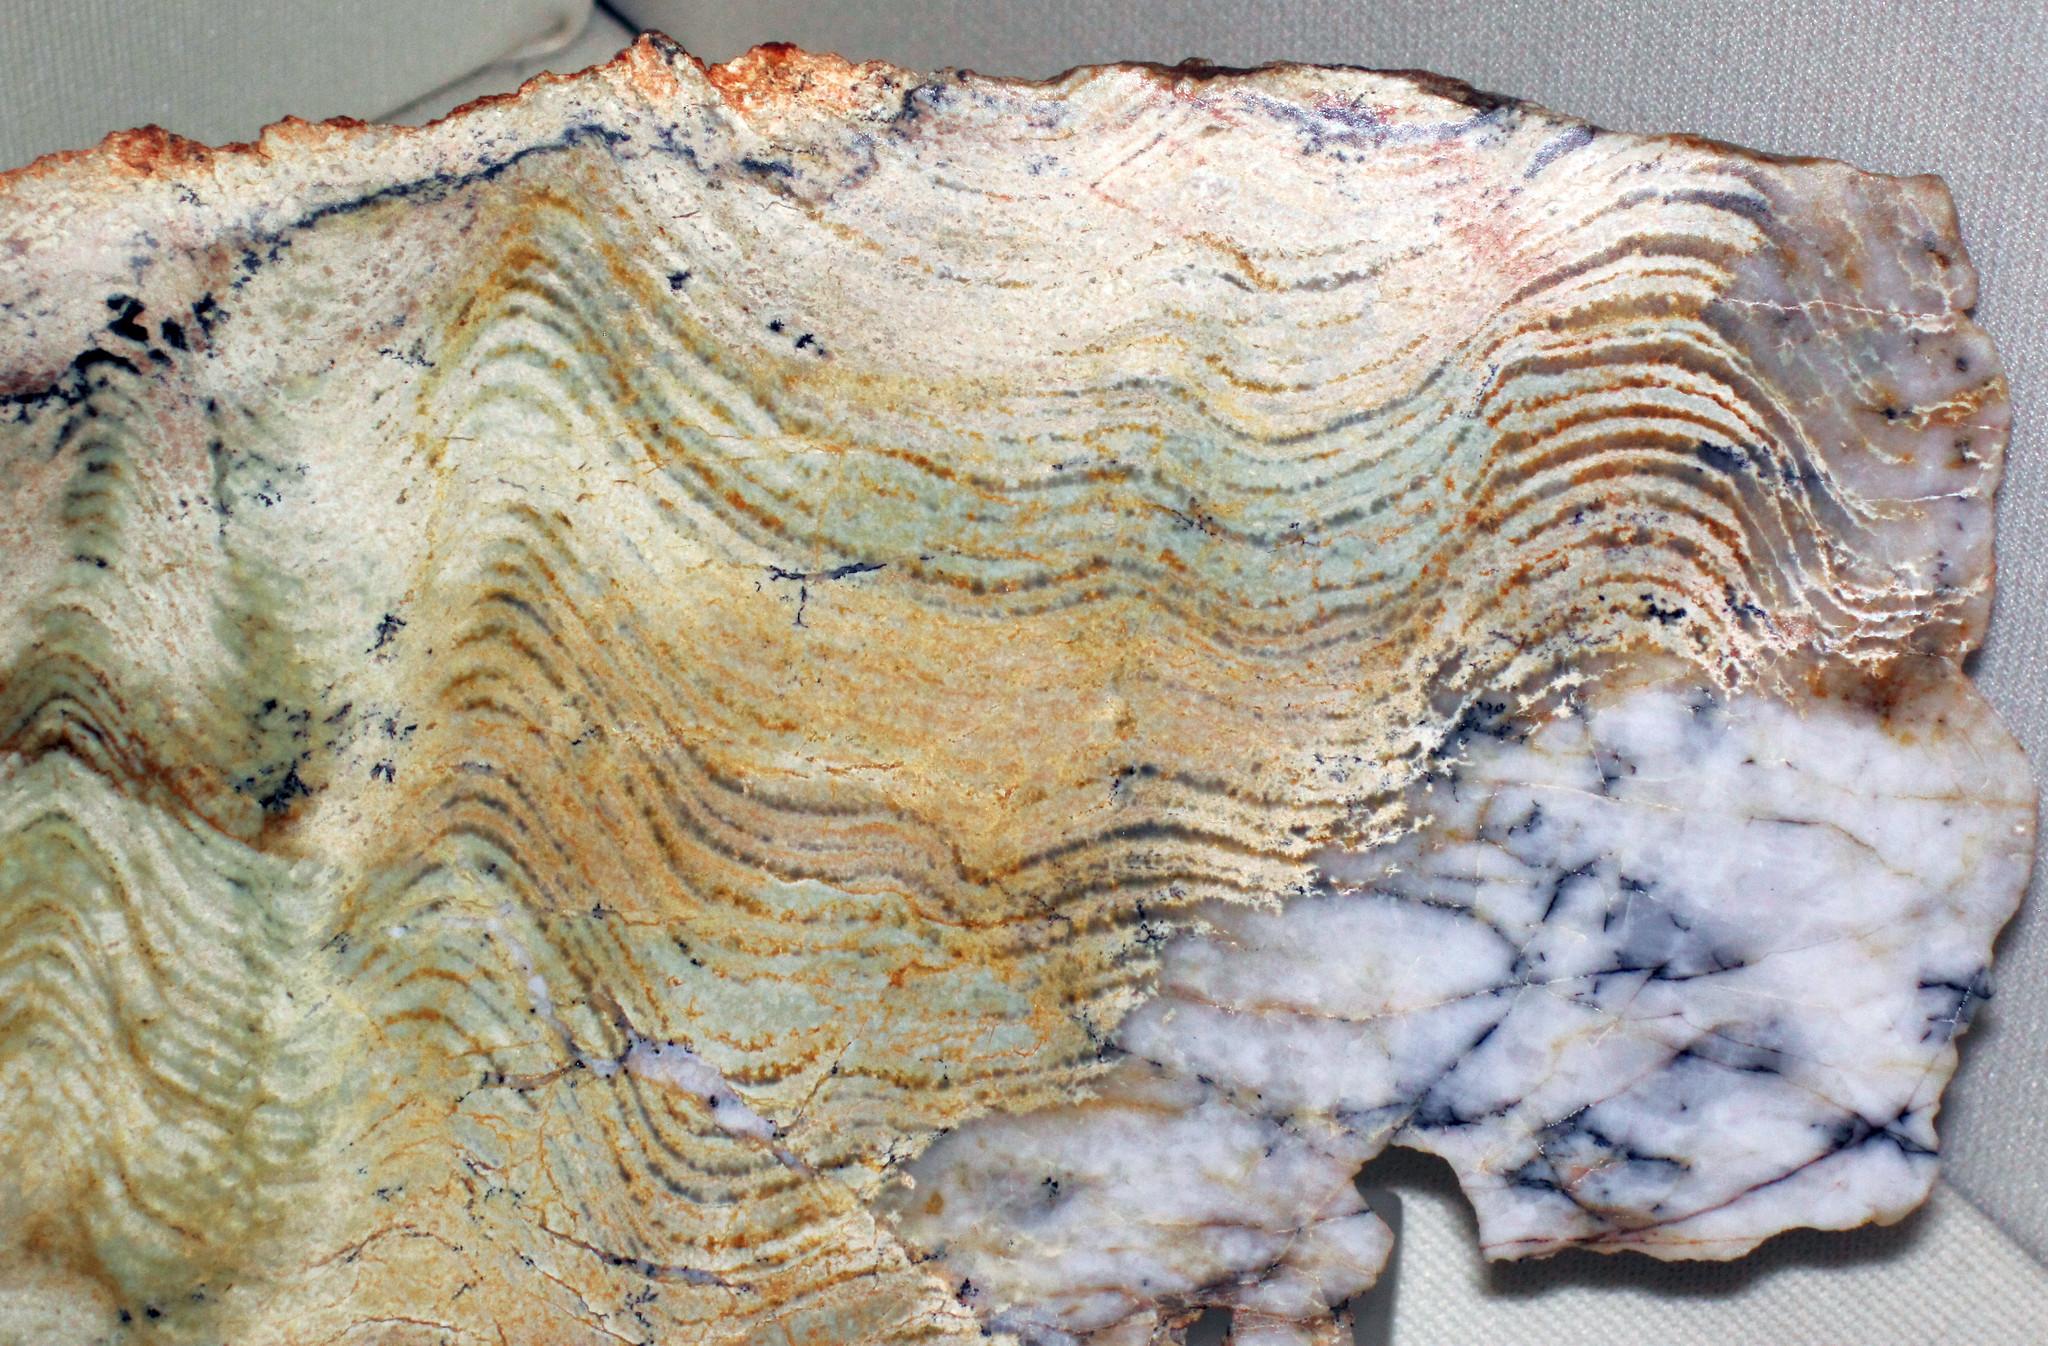 Stromatolite (Strelley Pool Formation, Paleoarchean, 3.35-3.46 Ga; East Strelley Greenstone Belt, Pilbara Craton, Western Australia) 3